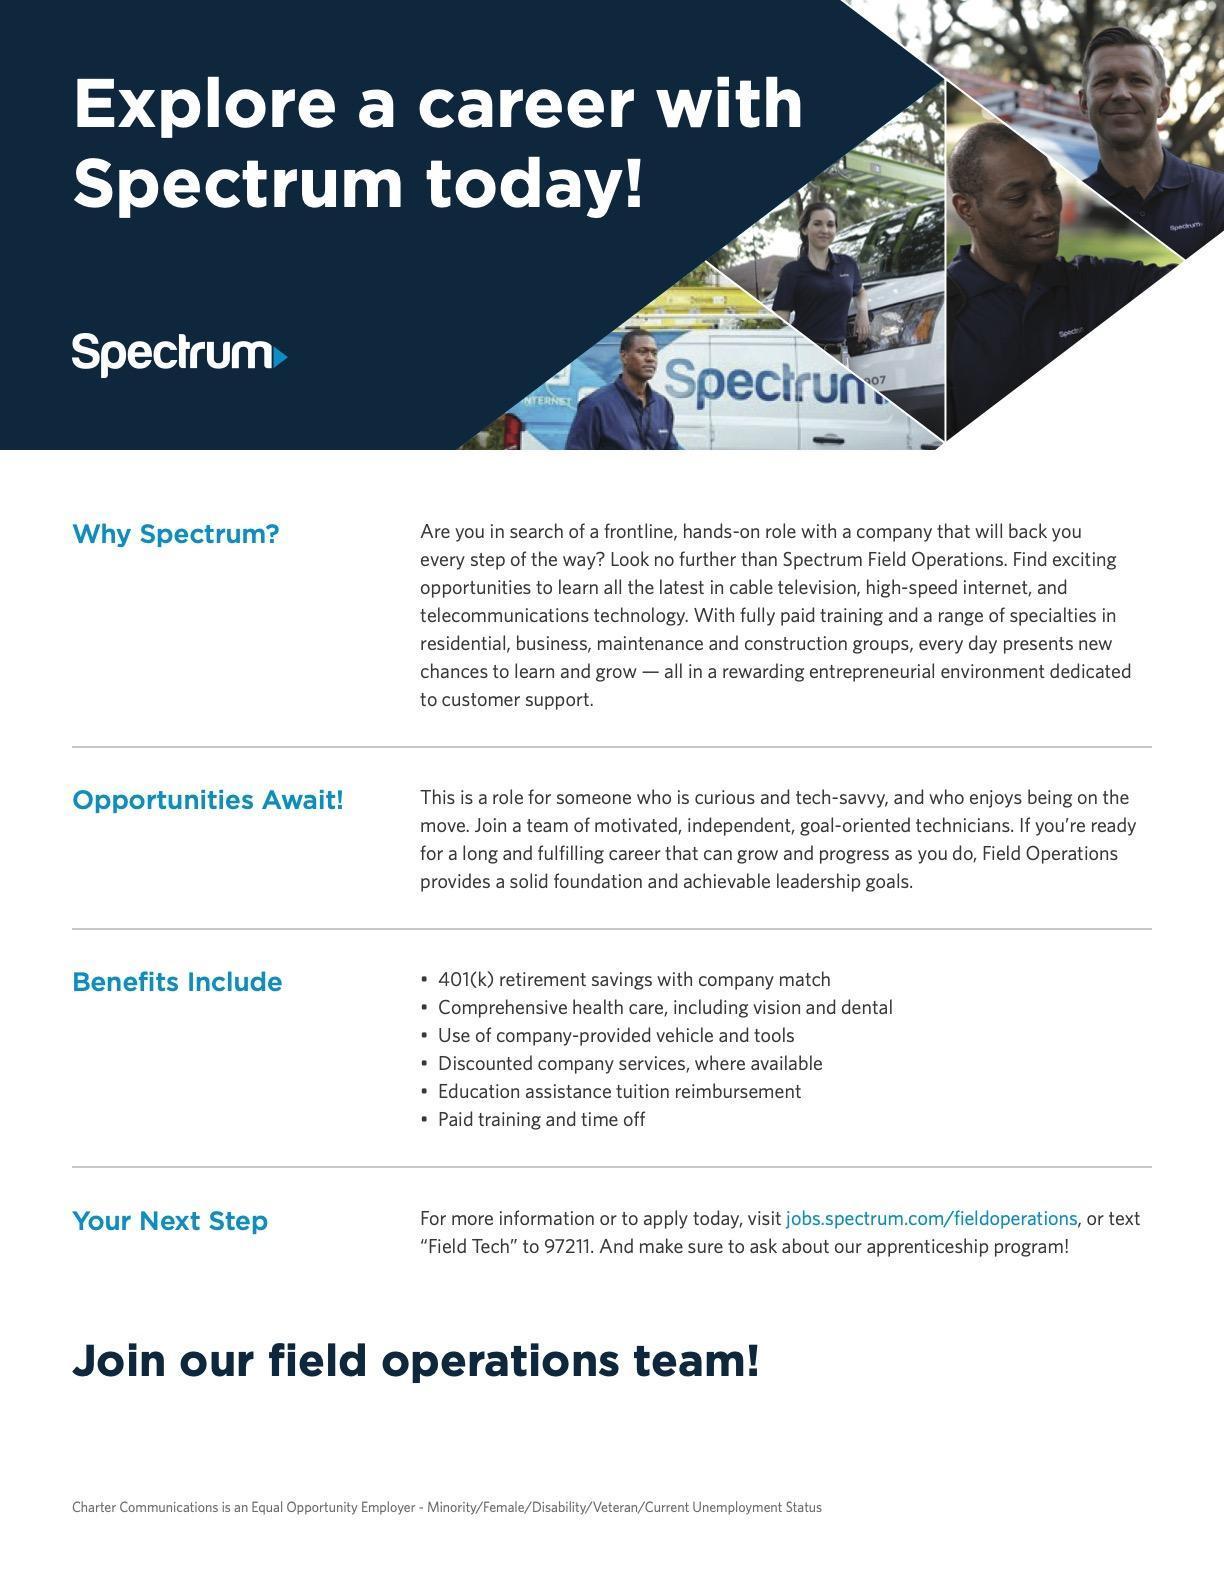 Spectrum job posting